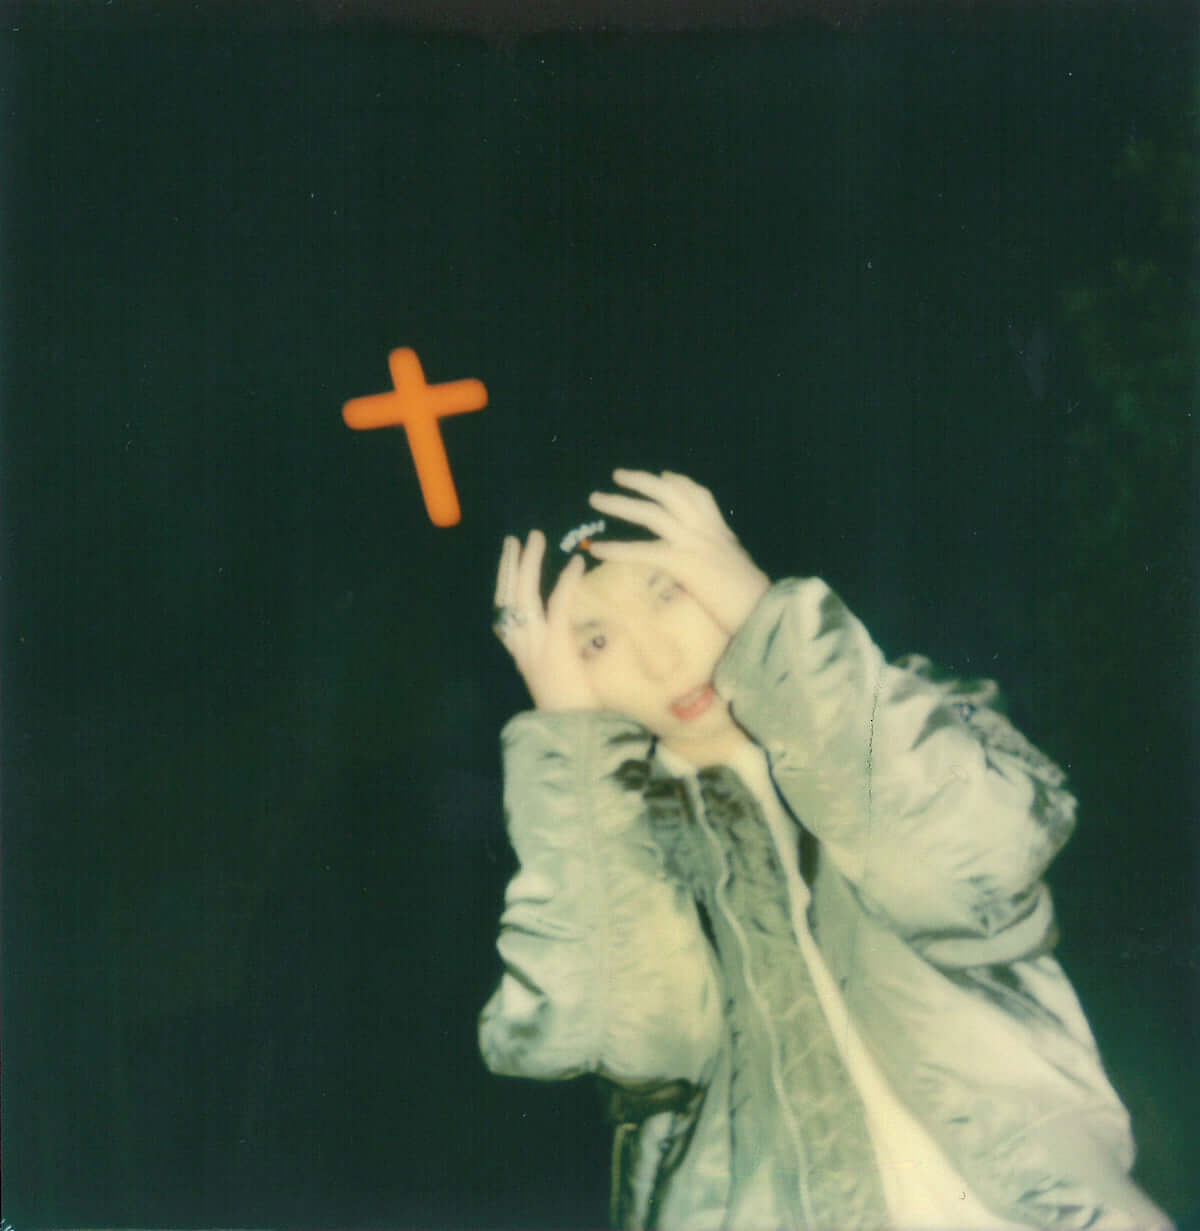 ZORNとKvi Babaが客演に参加。DJ CHARIとの活動でも知られるDJ TATSUKIが新曲をリリース。 music190131-djtatsuki-3-1200x1231